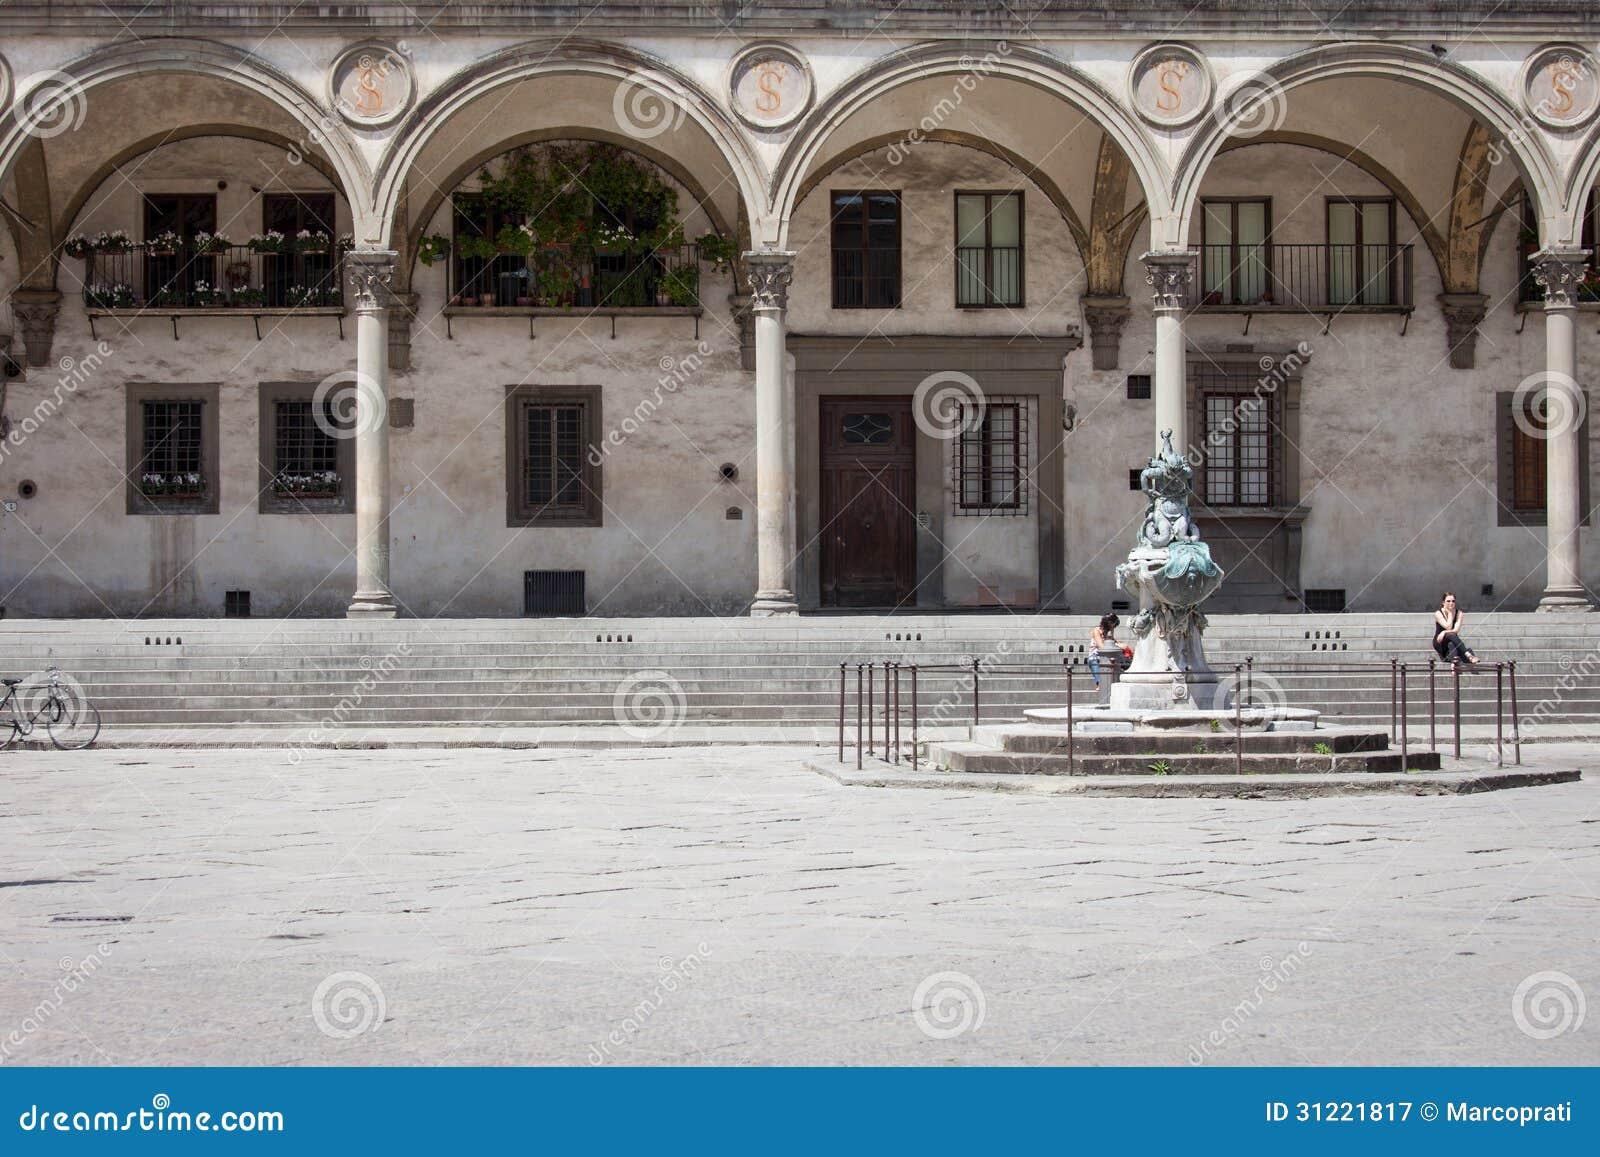 Ospedale degli Innocenti Florence